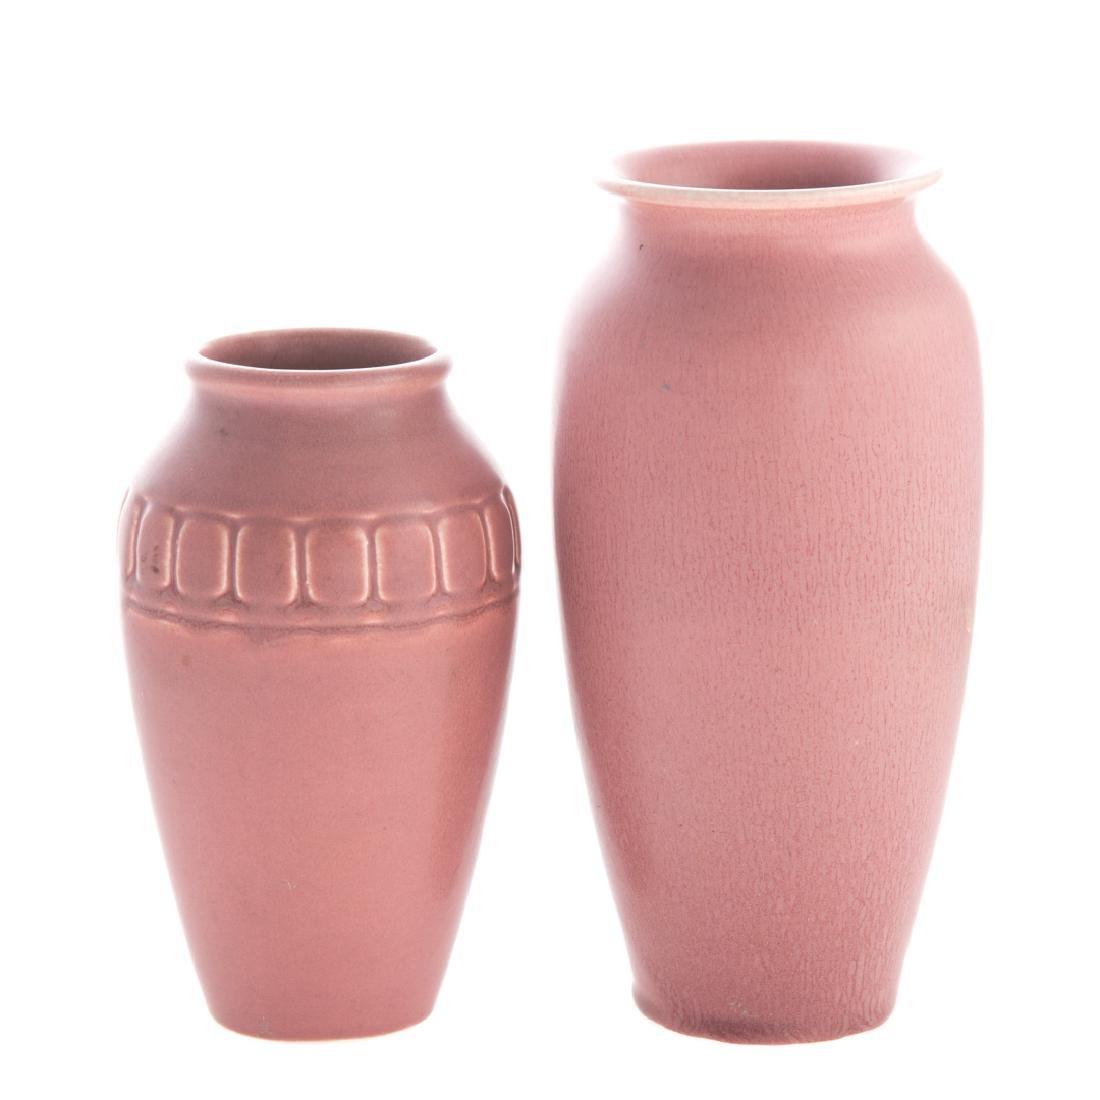 Four Rookwood art pottery vases - 4